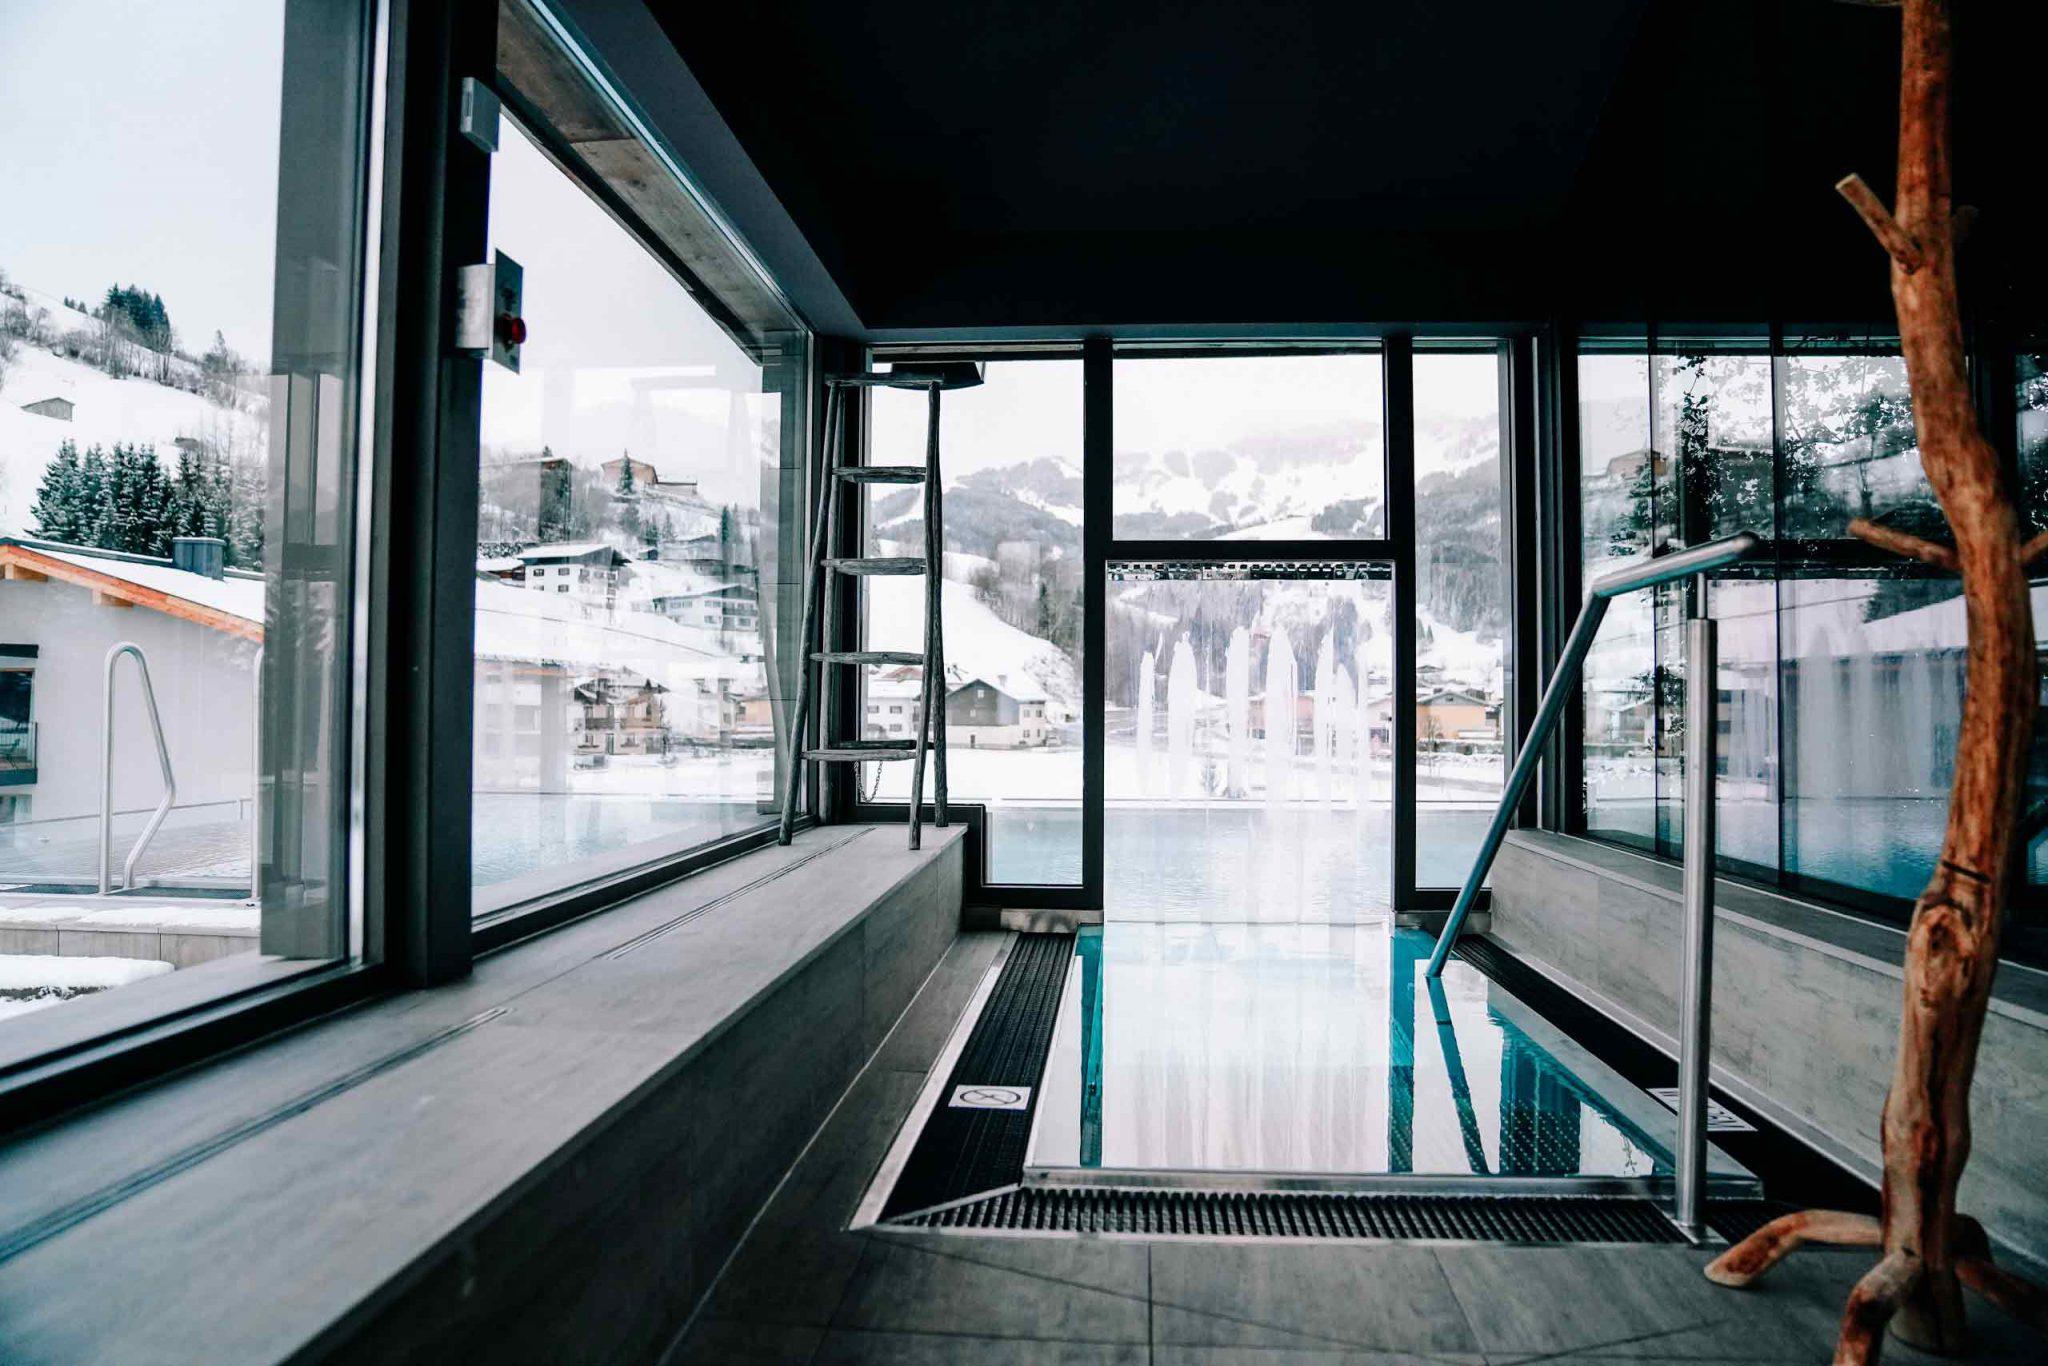 Levis_Austria_Ski_Trip_Ilsoo_van_Dijk_ISVD_10122019-01507